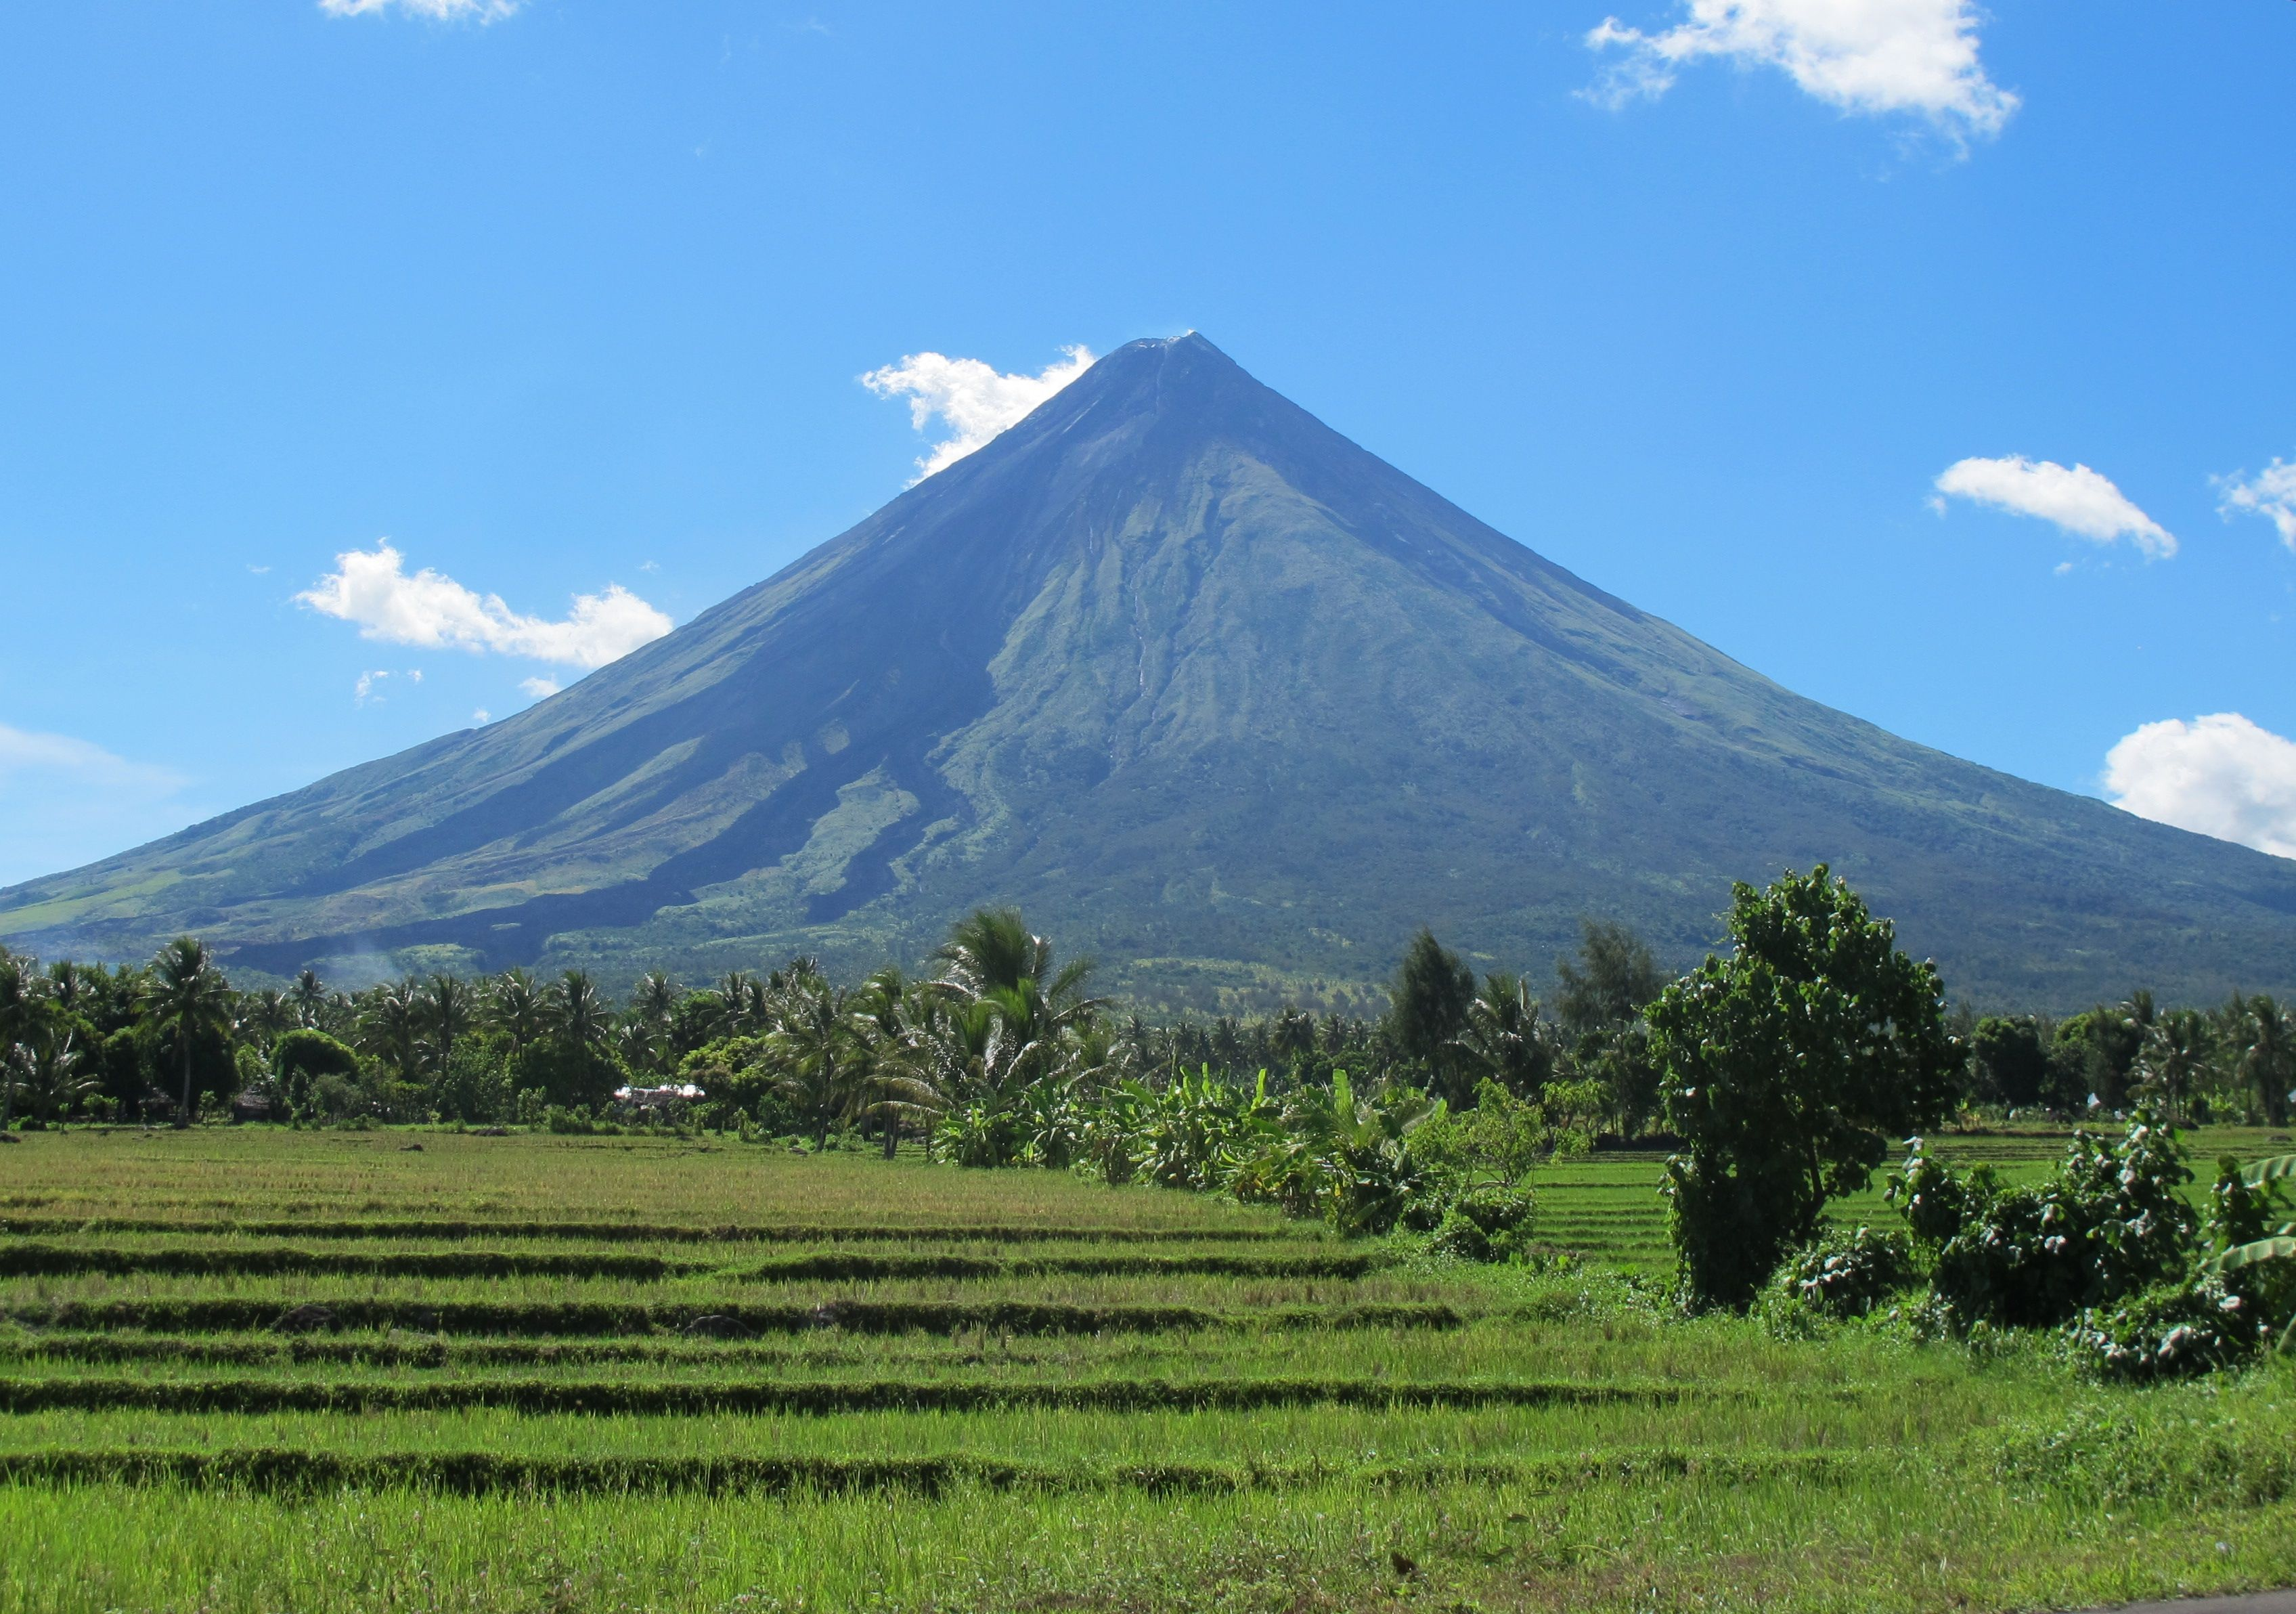 Parque Natural del volcán Mayon, Filipinas | Volcanoes | Pinterest ...